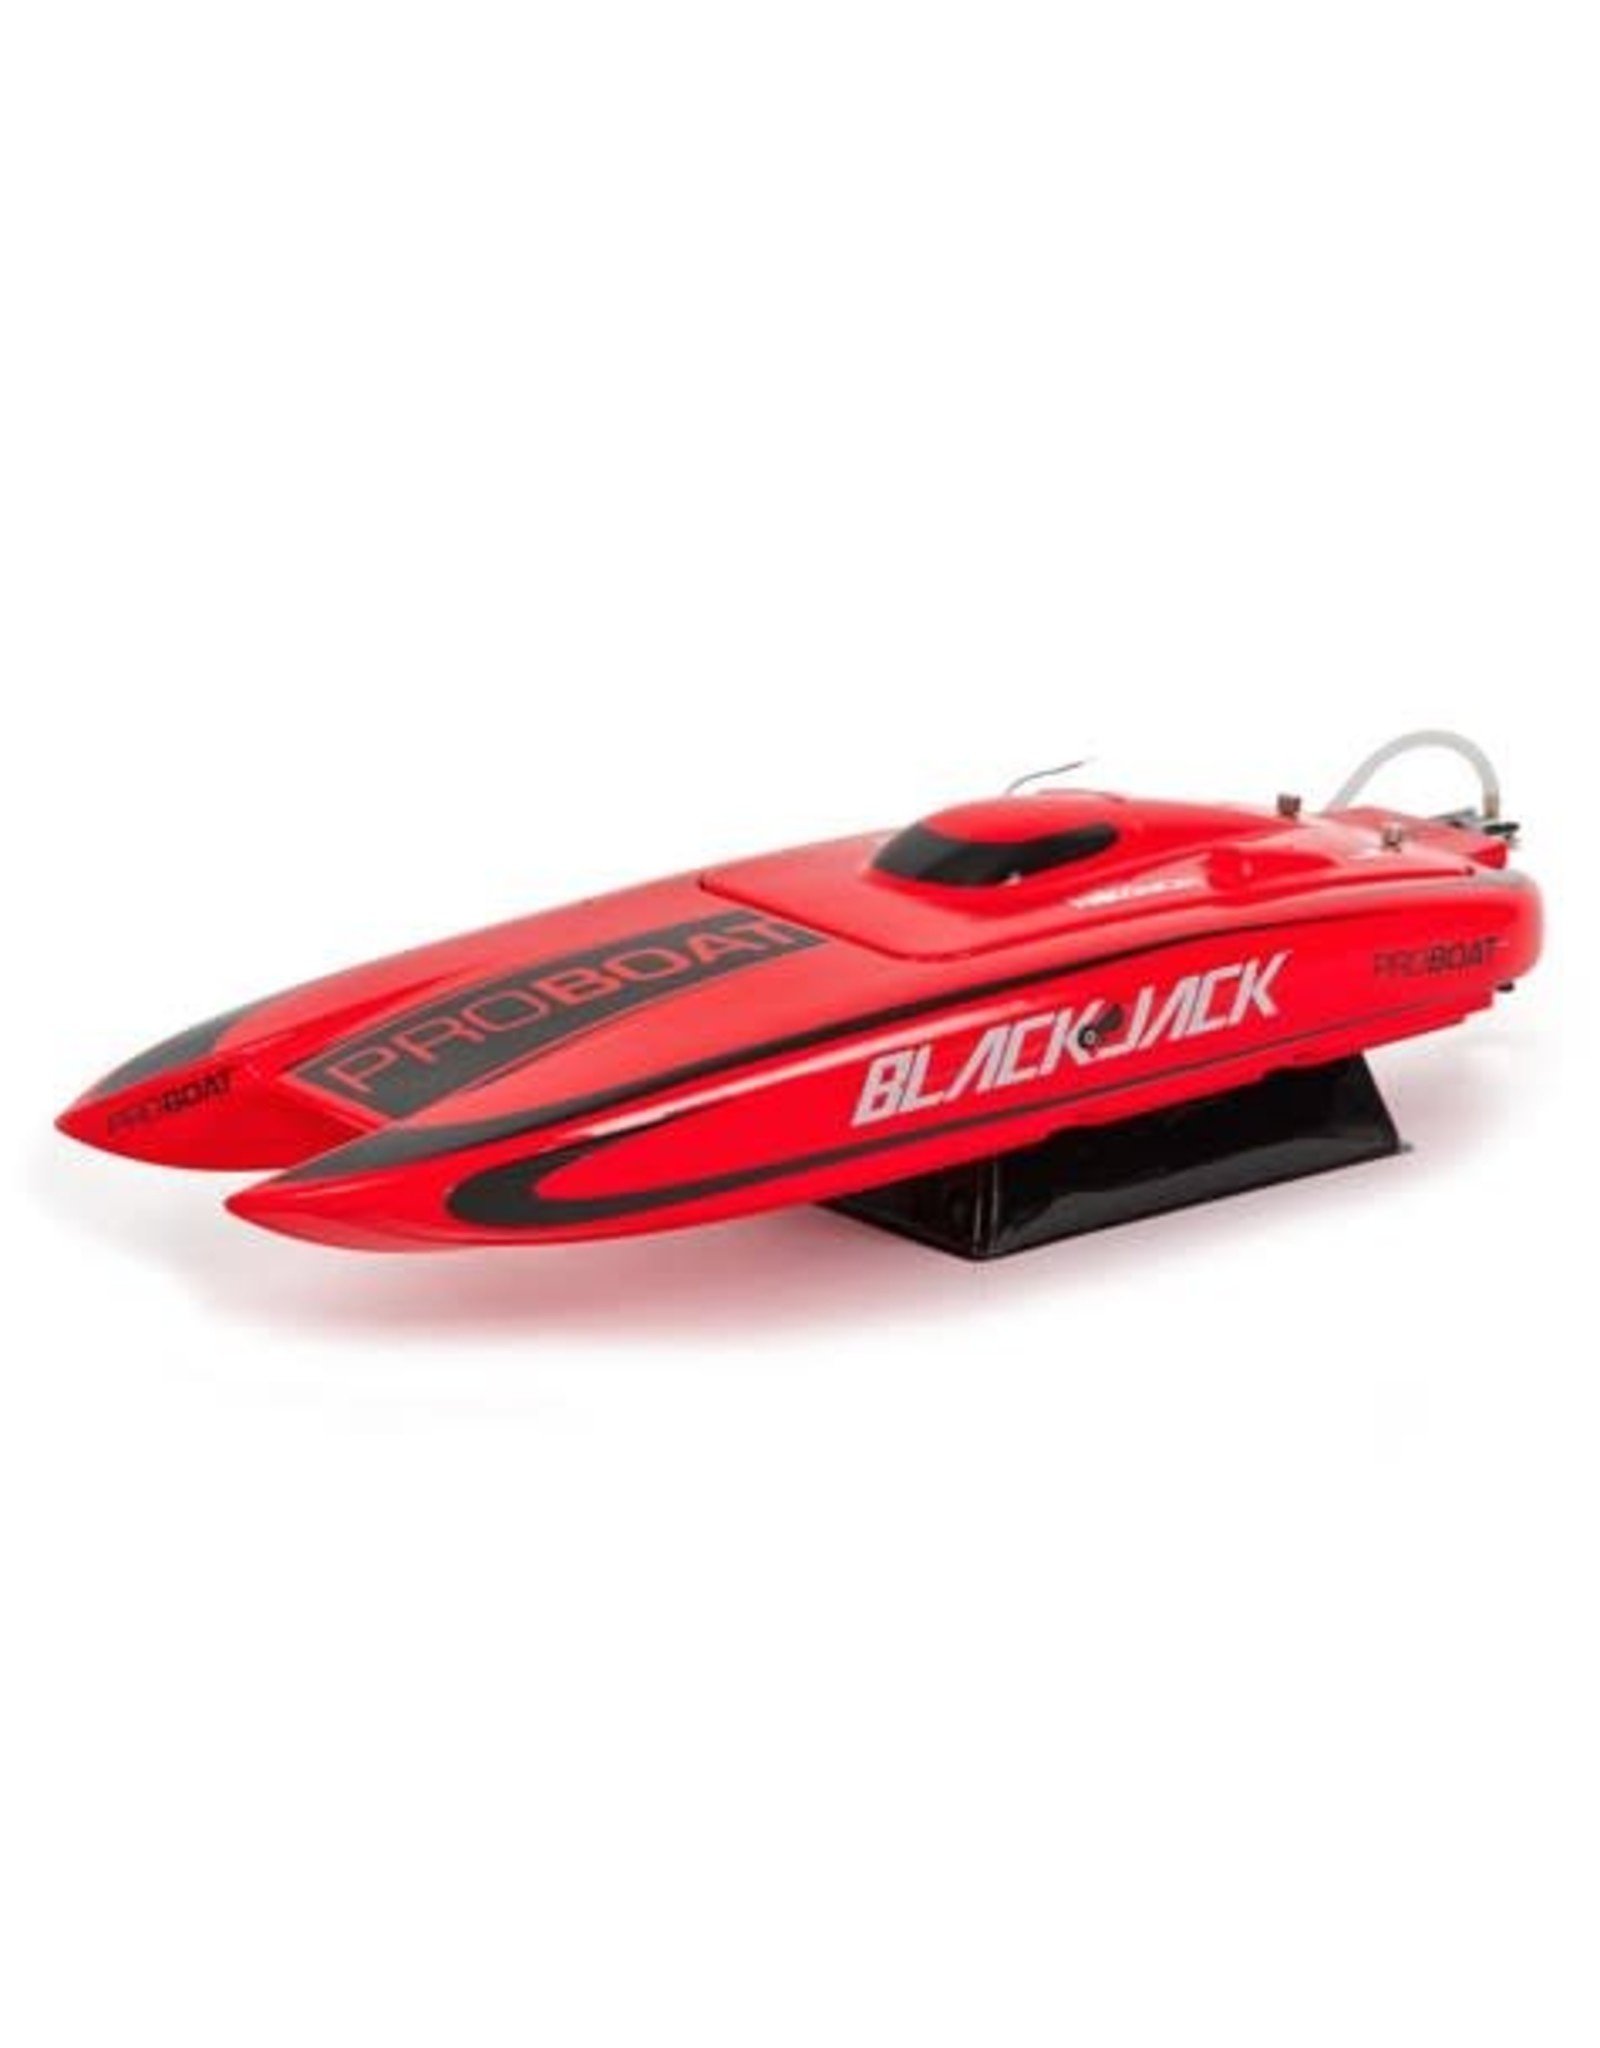 Pro Boat Blackjack 24-inch Catamaran Brushless: RTR